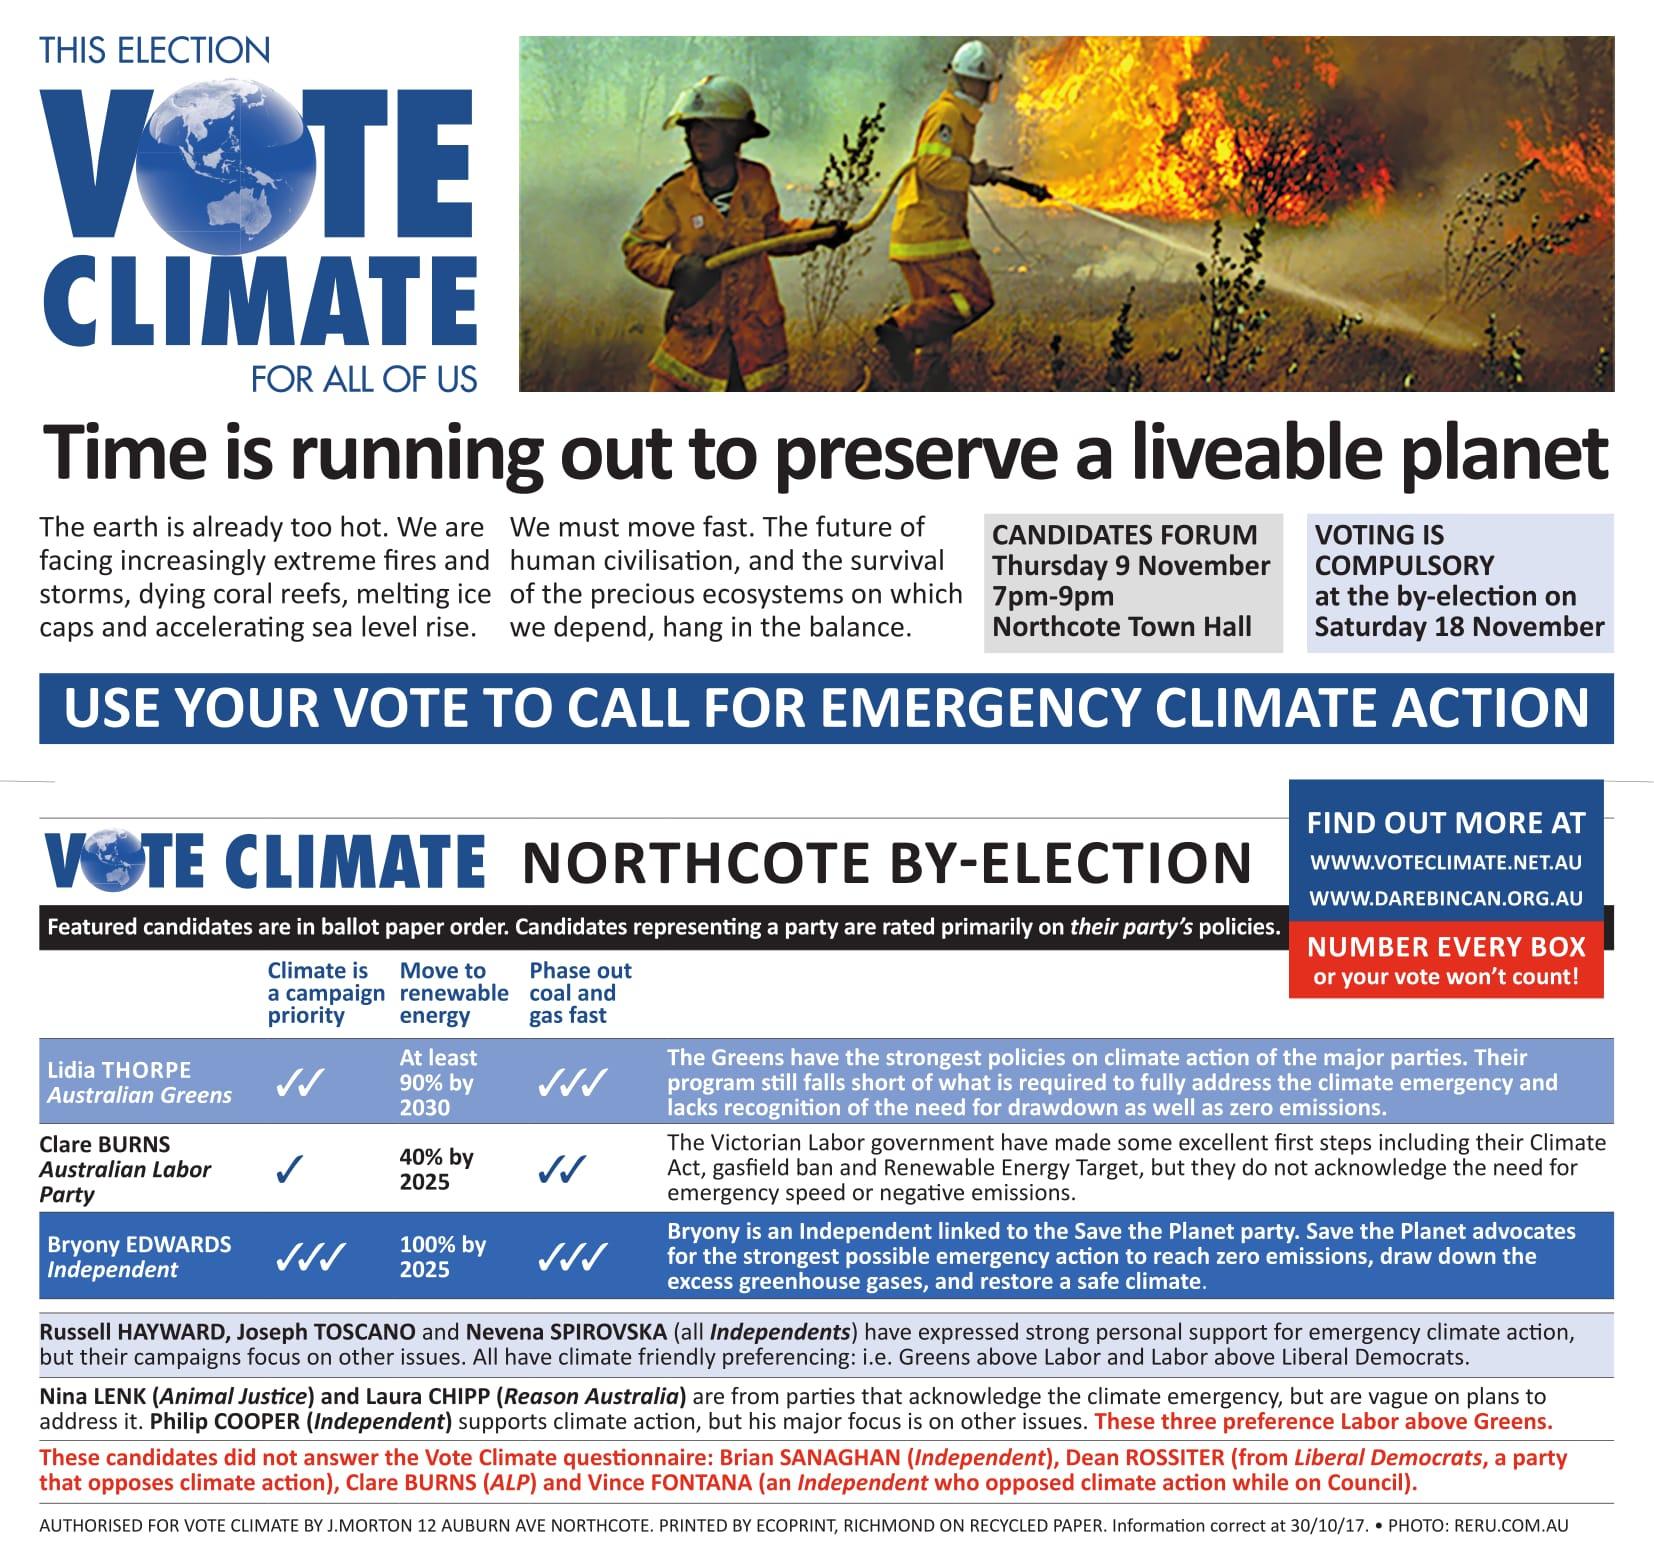 VoteClimate_Scorecard_Facebook.jpg